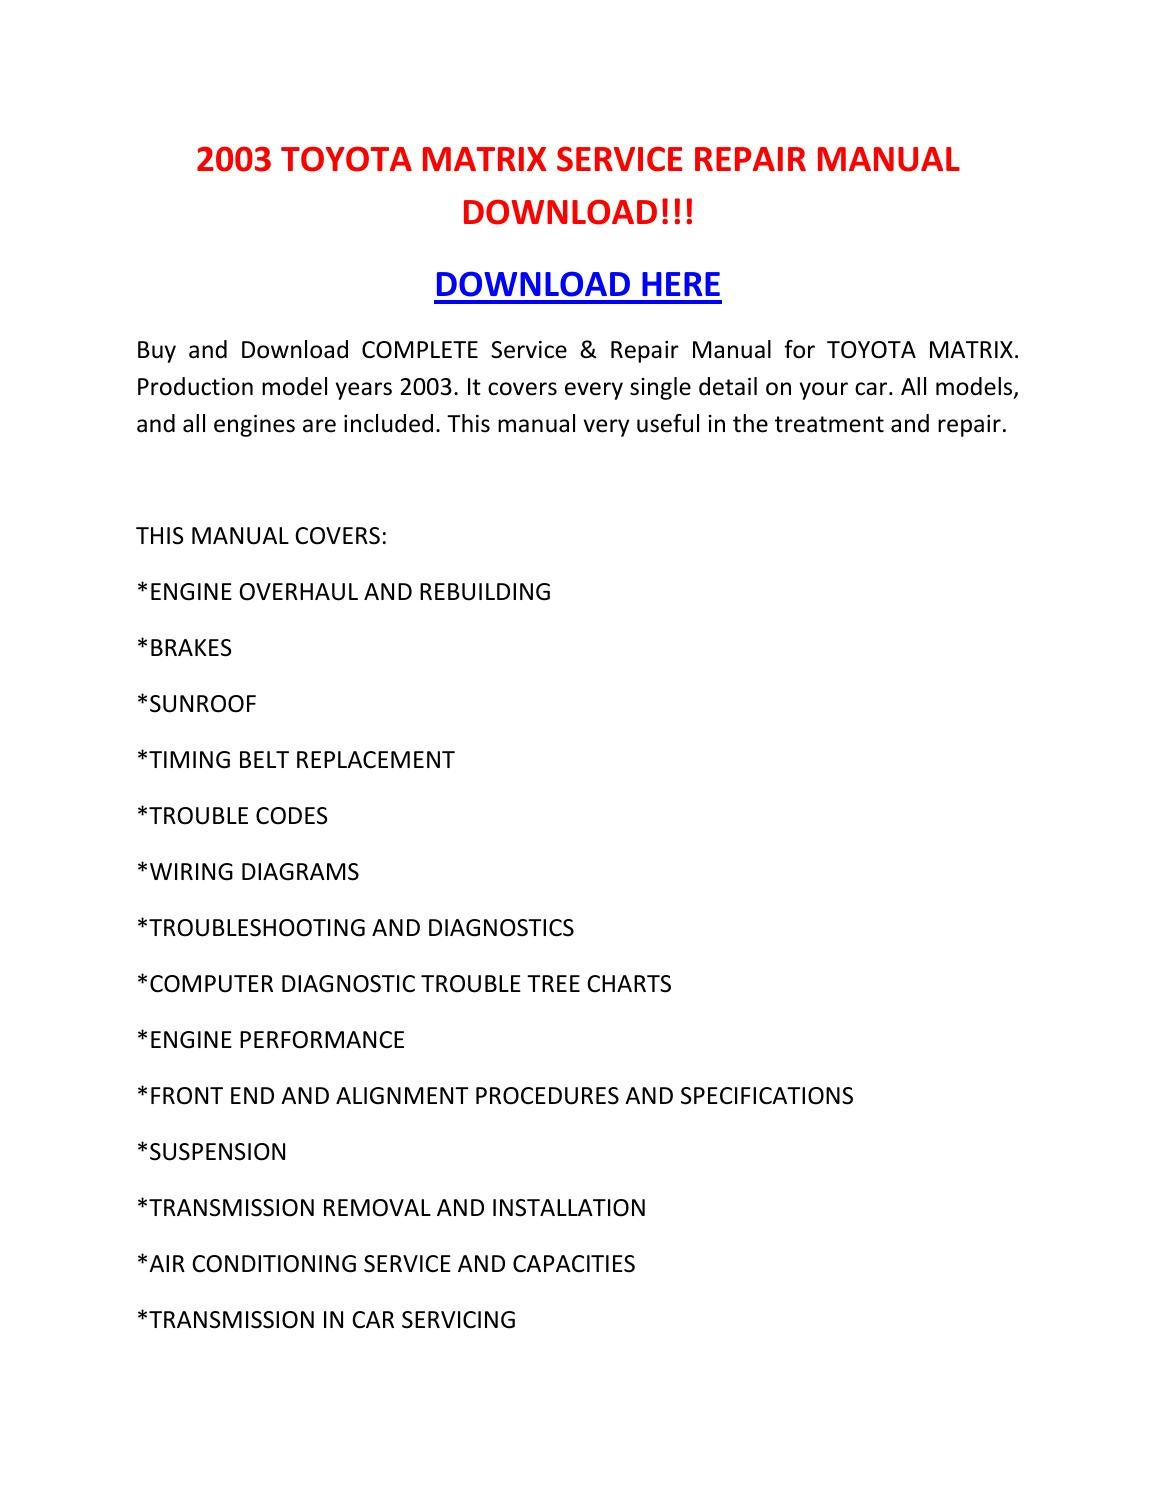 2003 Toyota Matrix Service Repair Manual Download    By